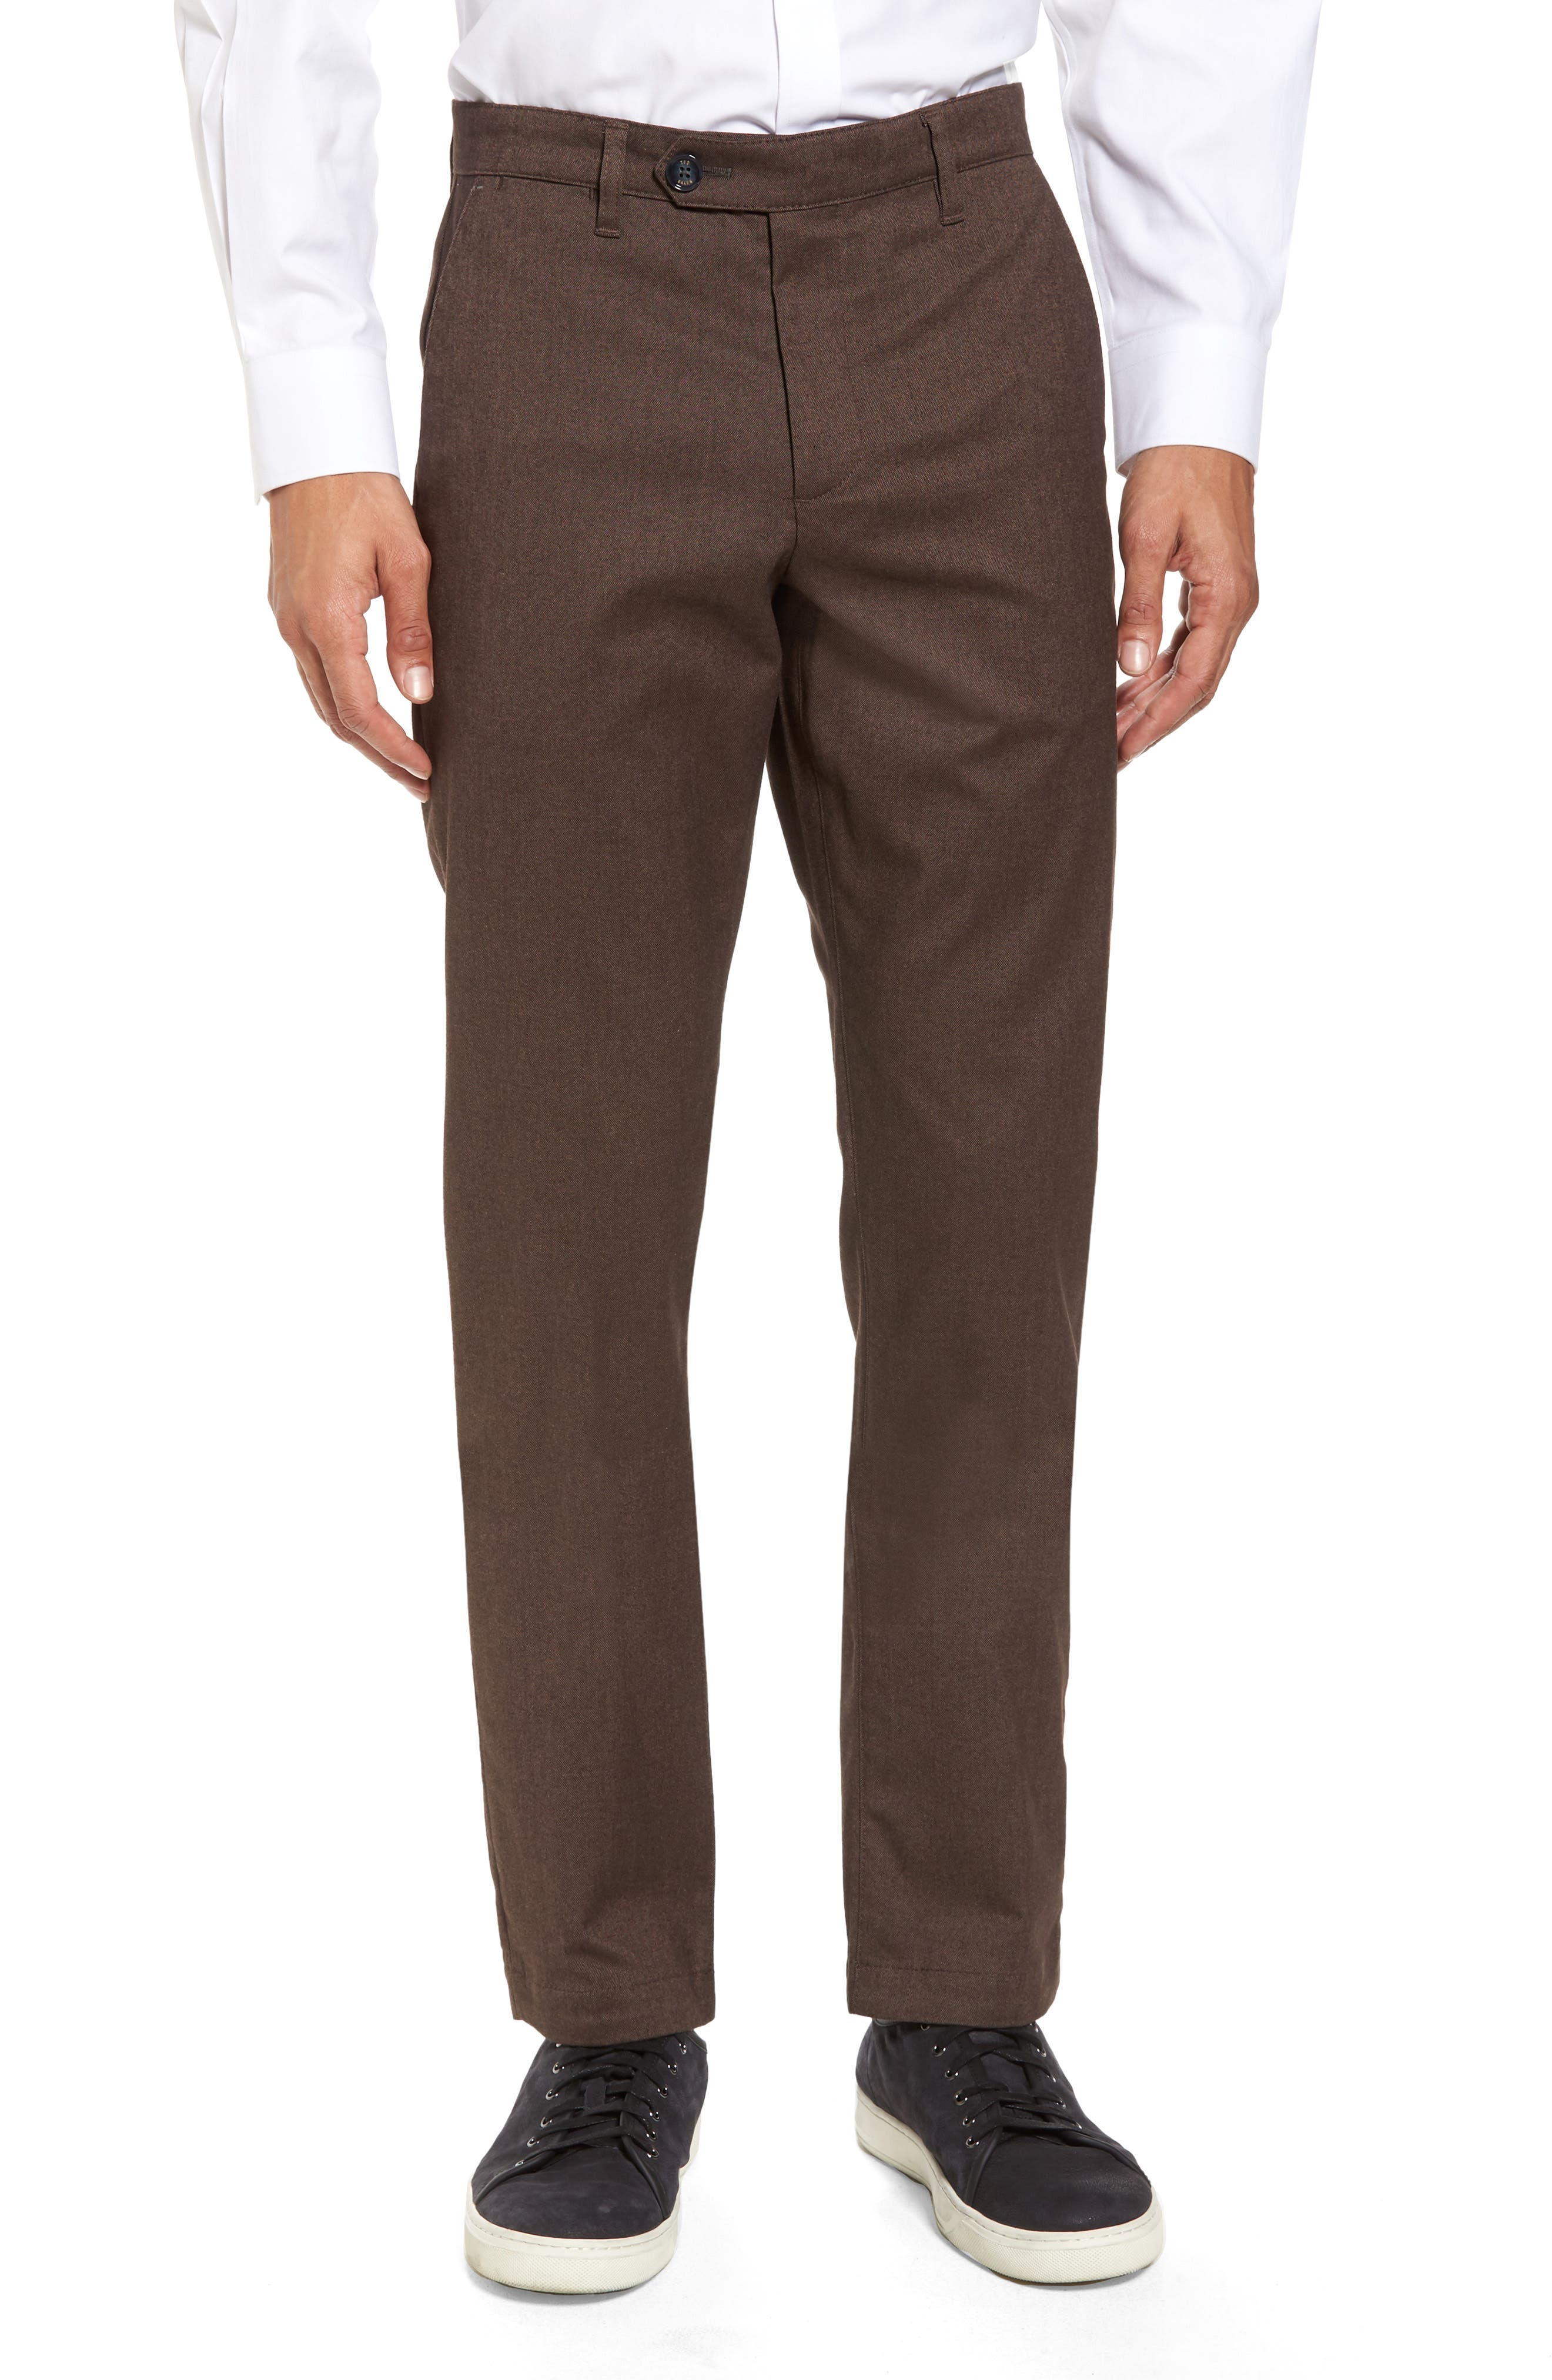 Freshman Modern Fit Brushed Pants,                         Main,                         color, 214